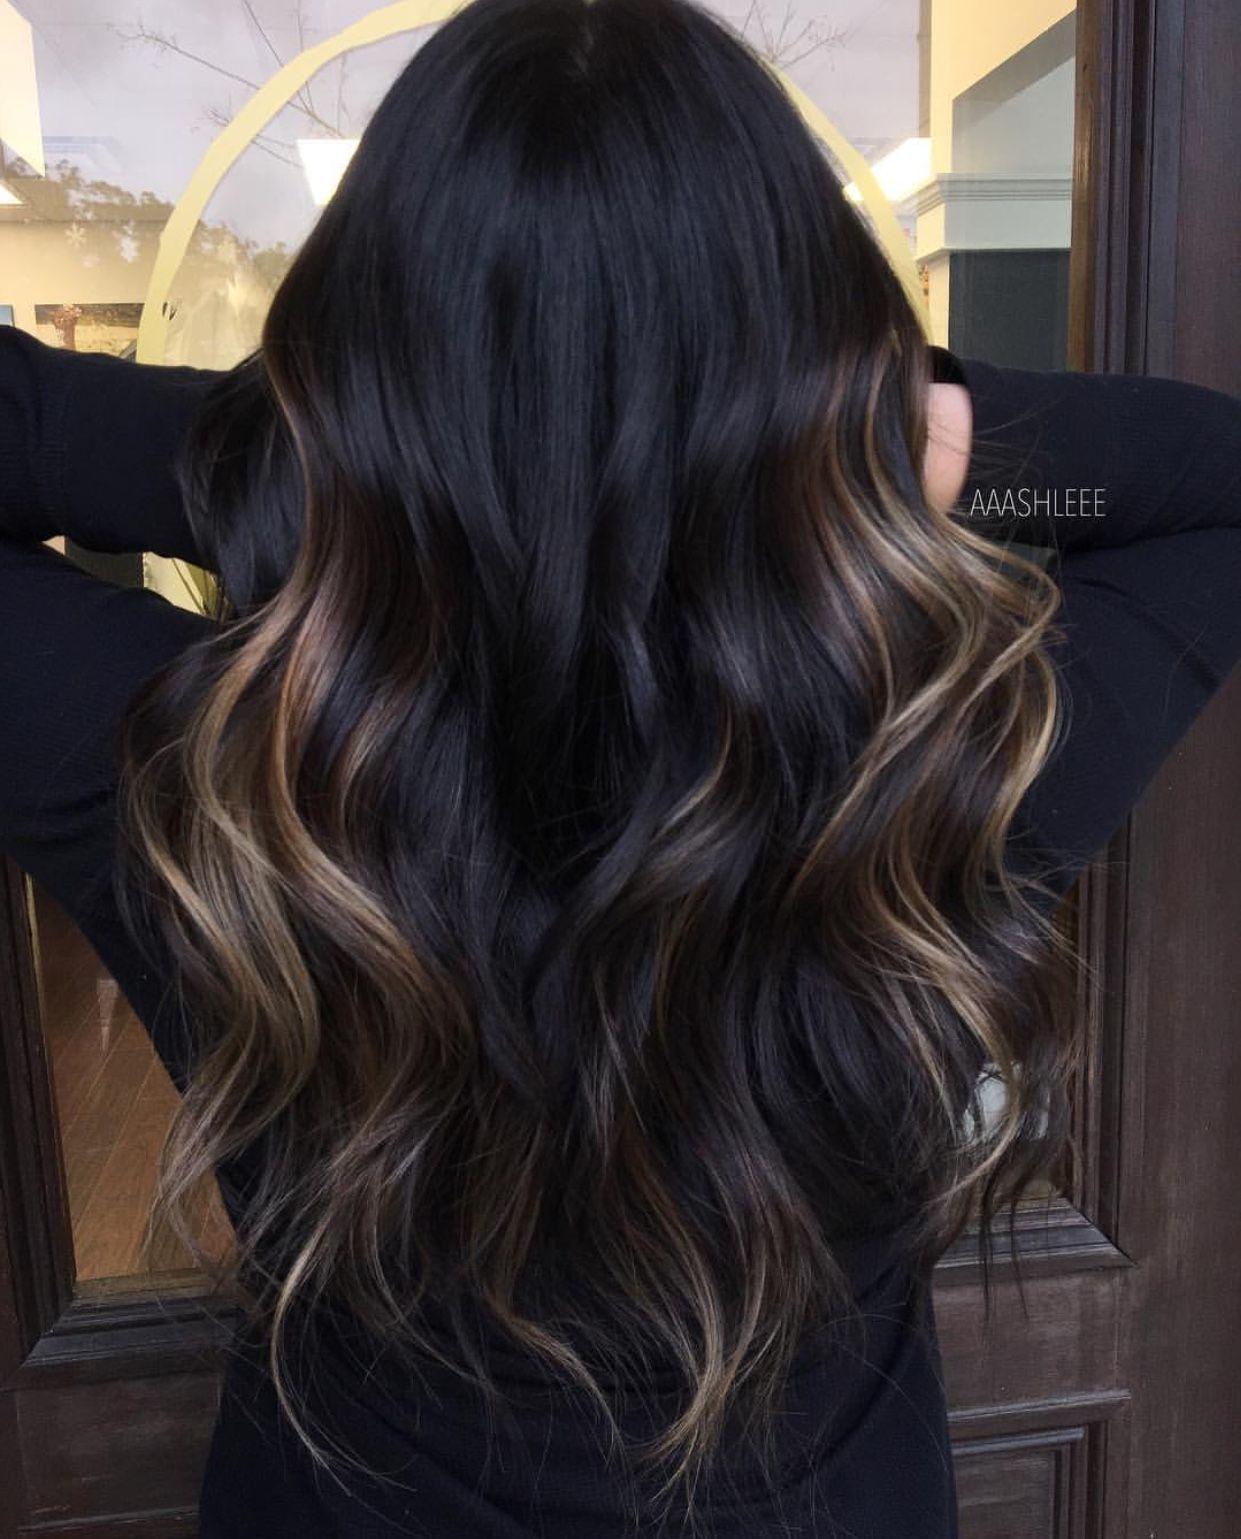 Dark Hair Caramel Highlights Hair Color Unique Black Hair Balayage Brown Hair Balayage